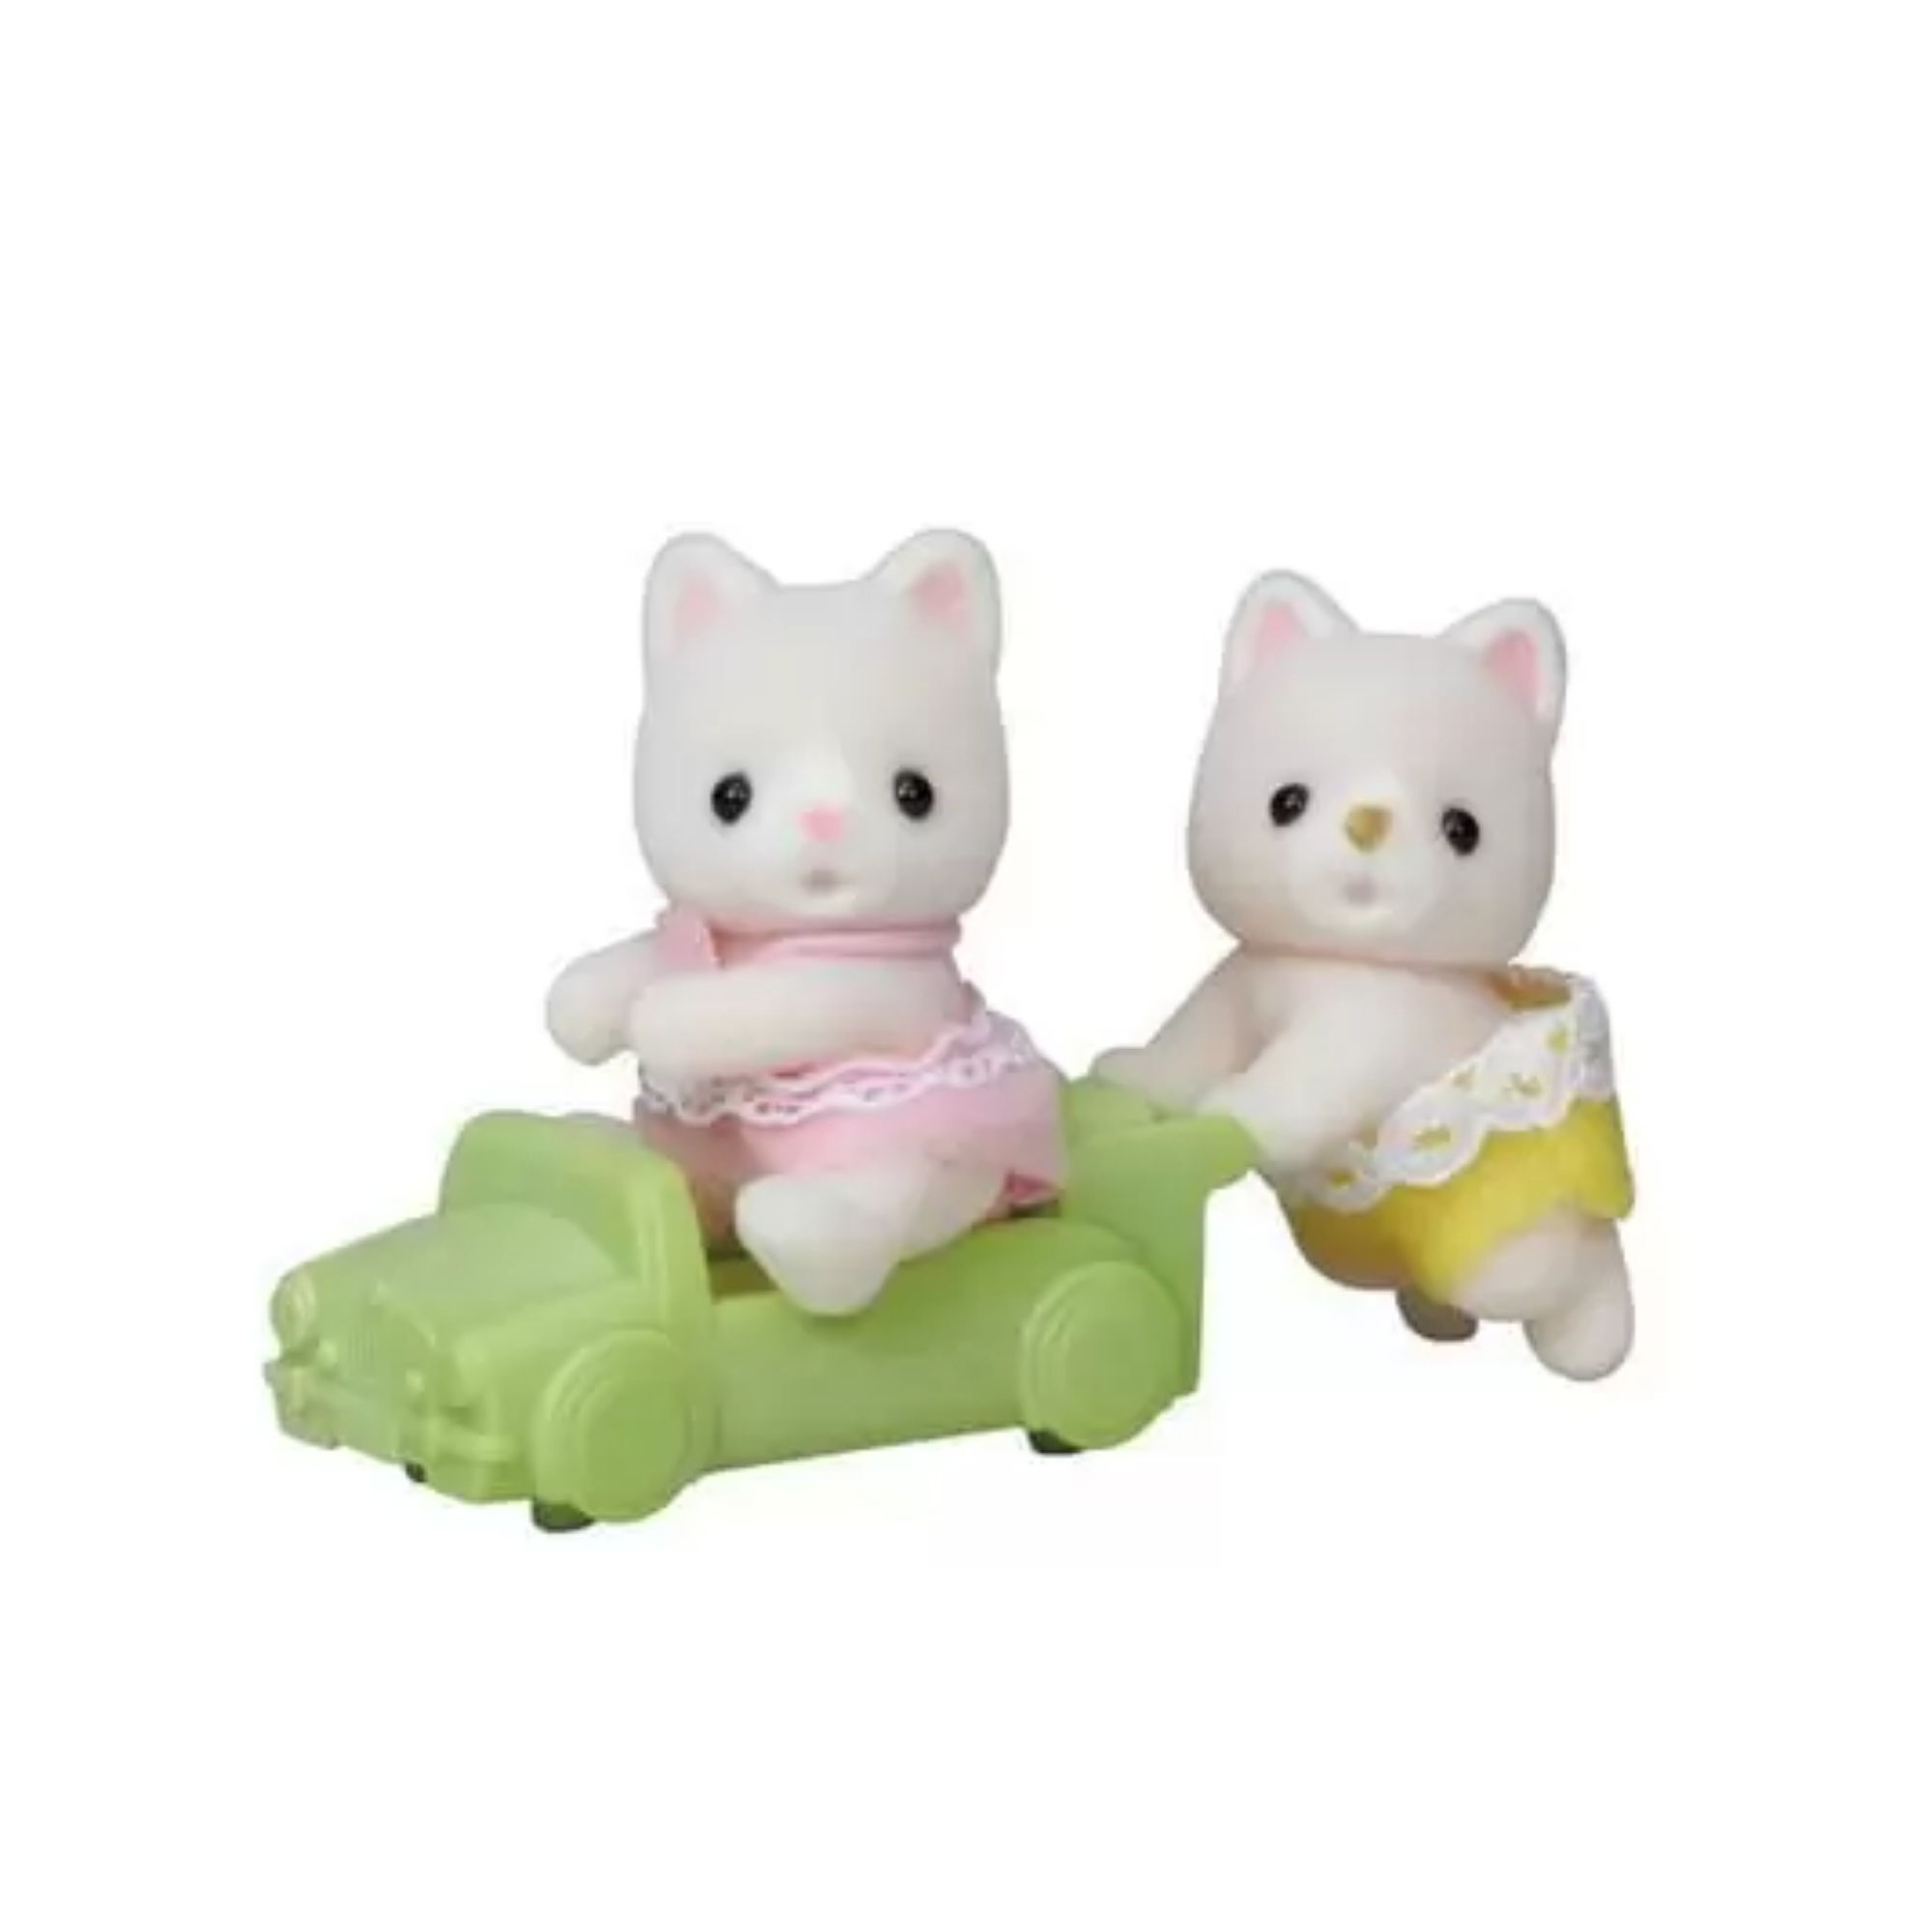 Brinquedo Sylvanian Families Bebê Gêmeos Gato de Seda Epoch  - Game Land Brinquedos